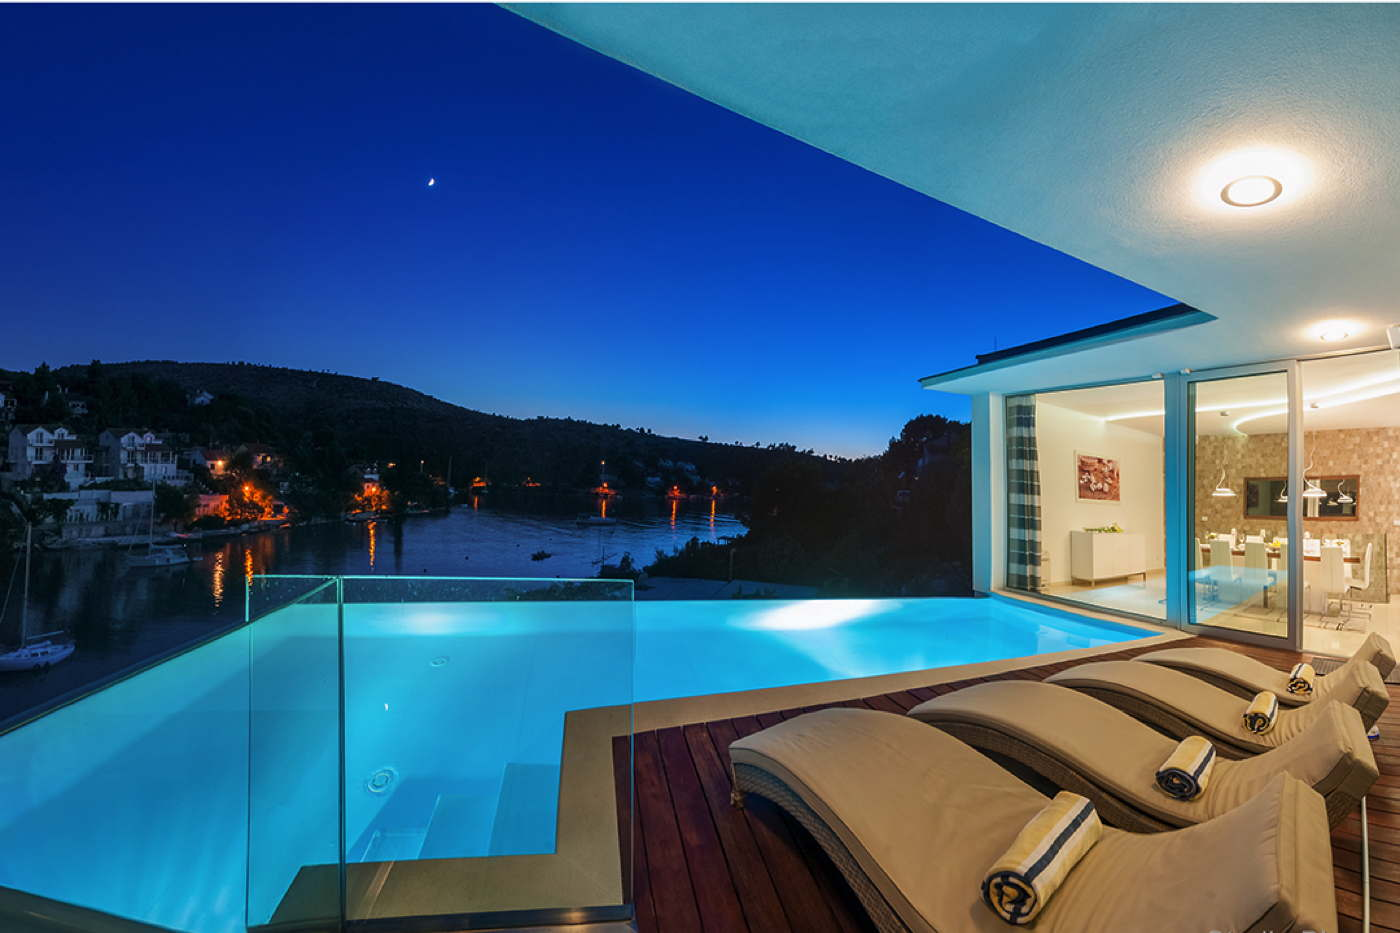 Moderne luxusvilla am meer  Moderne Luxusvilla mit Infinity-Pool direkt am Meer Insel Brac ...